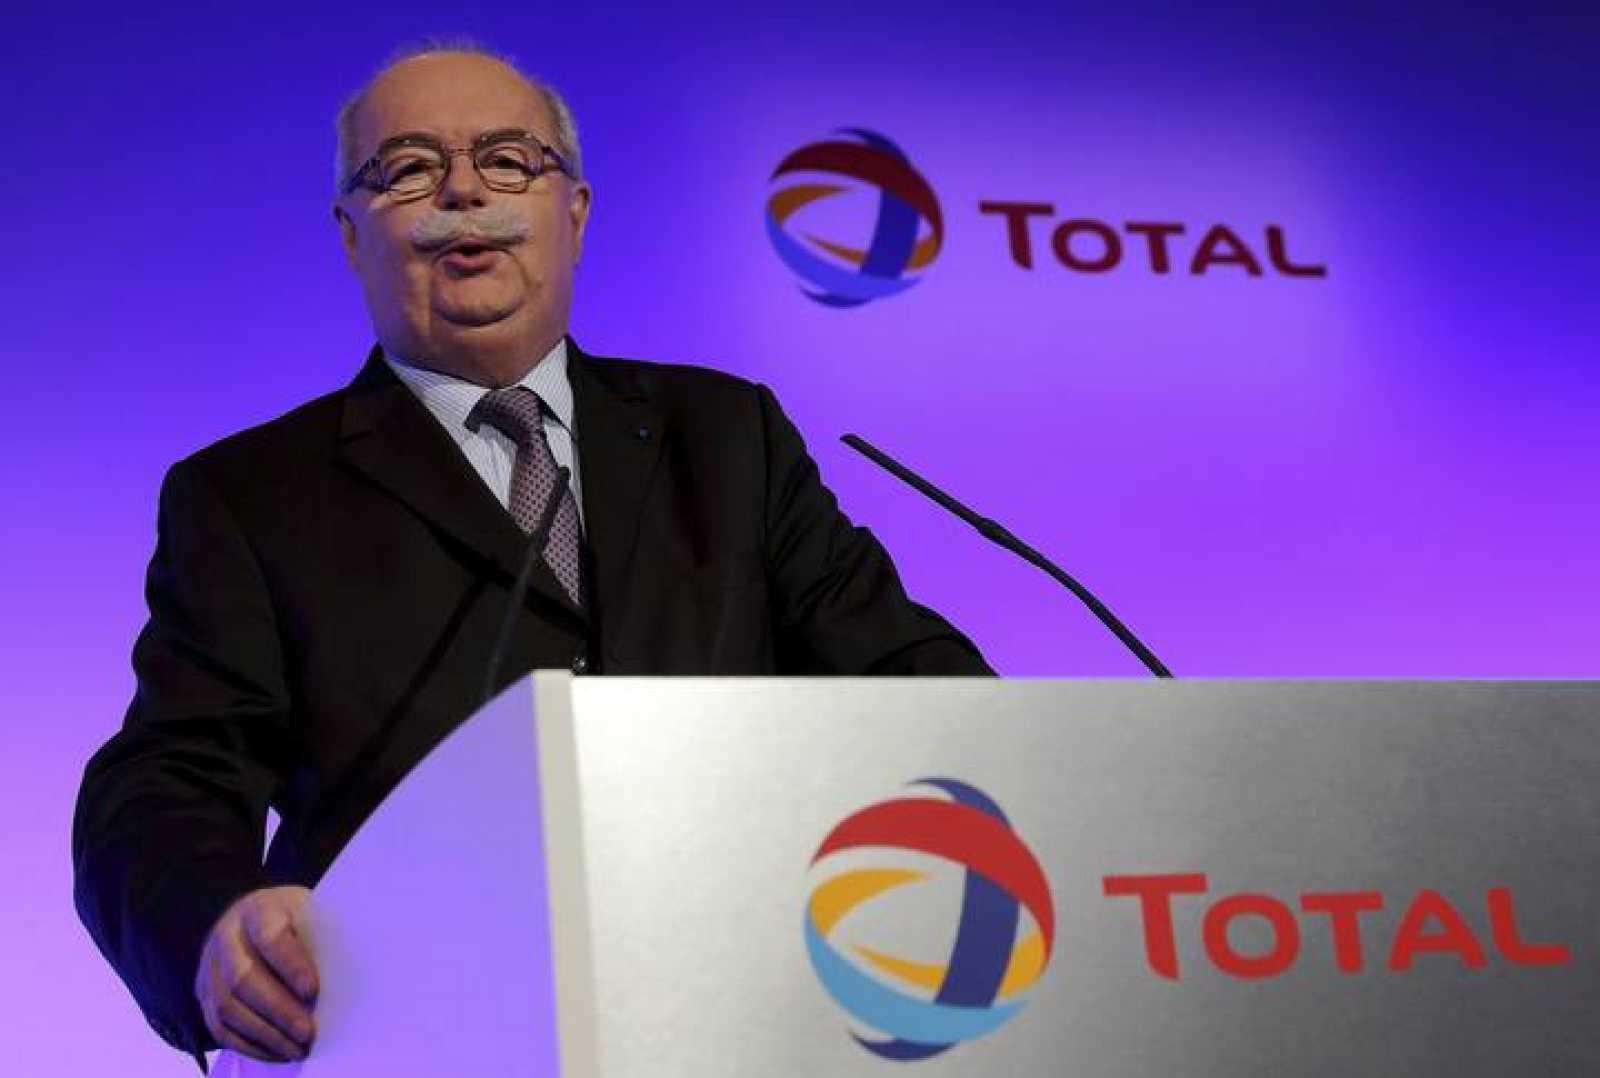 Christophe de Margerie, presidente de la petrolera Total, en una imagen de archivo.